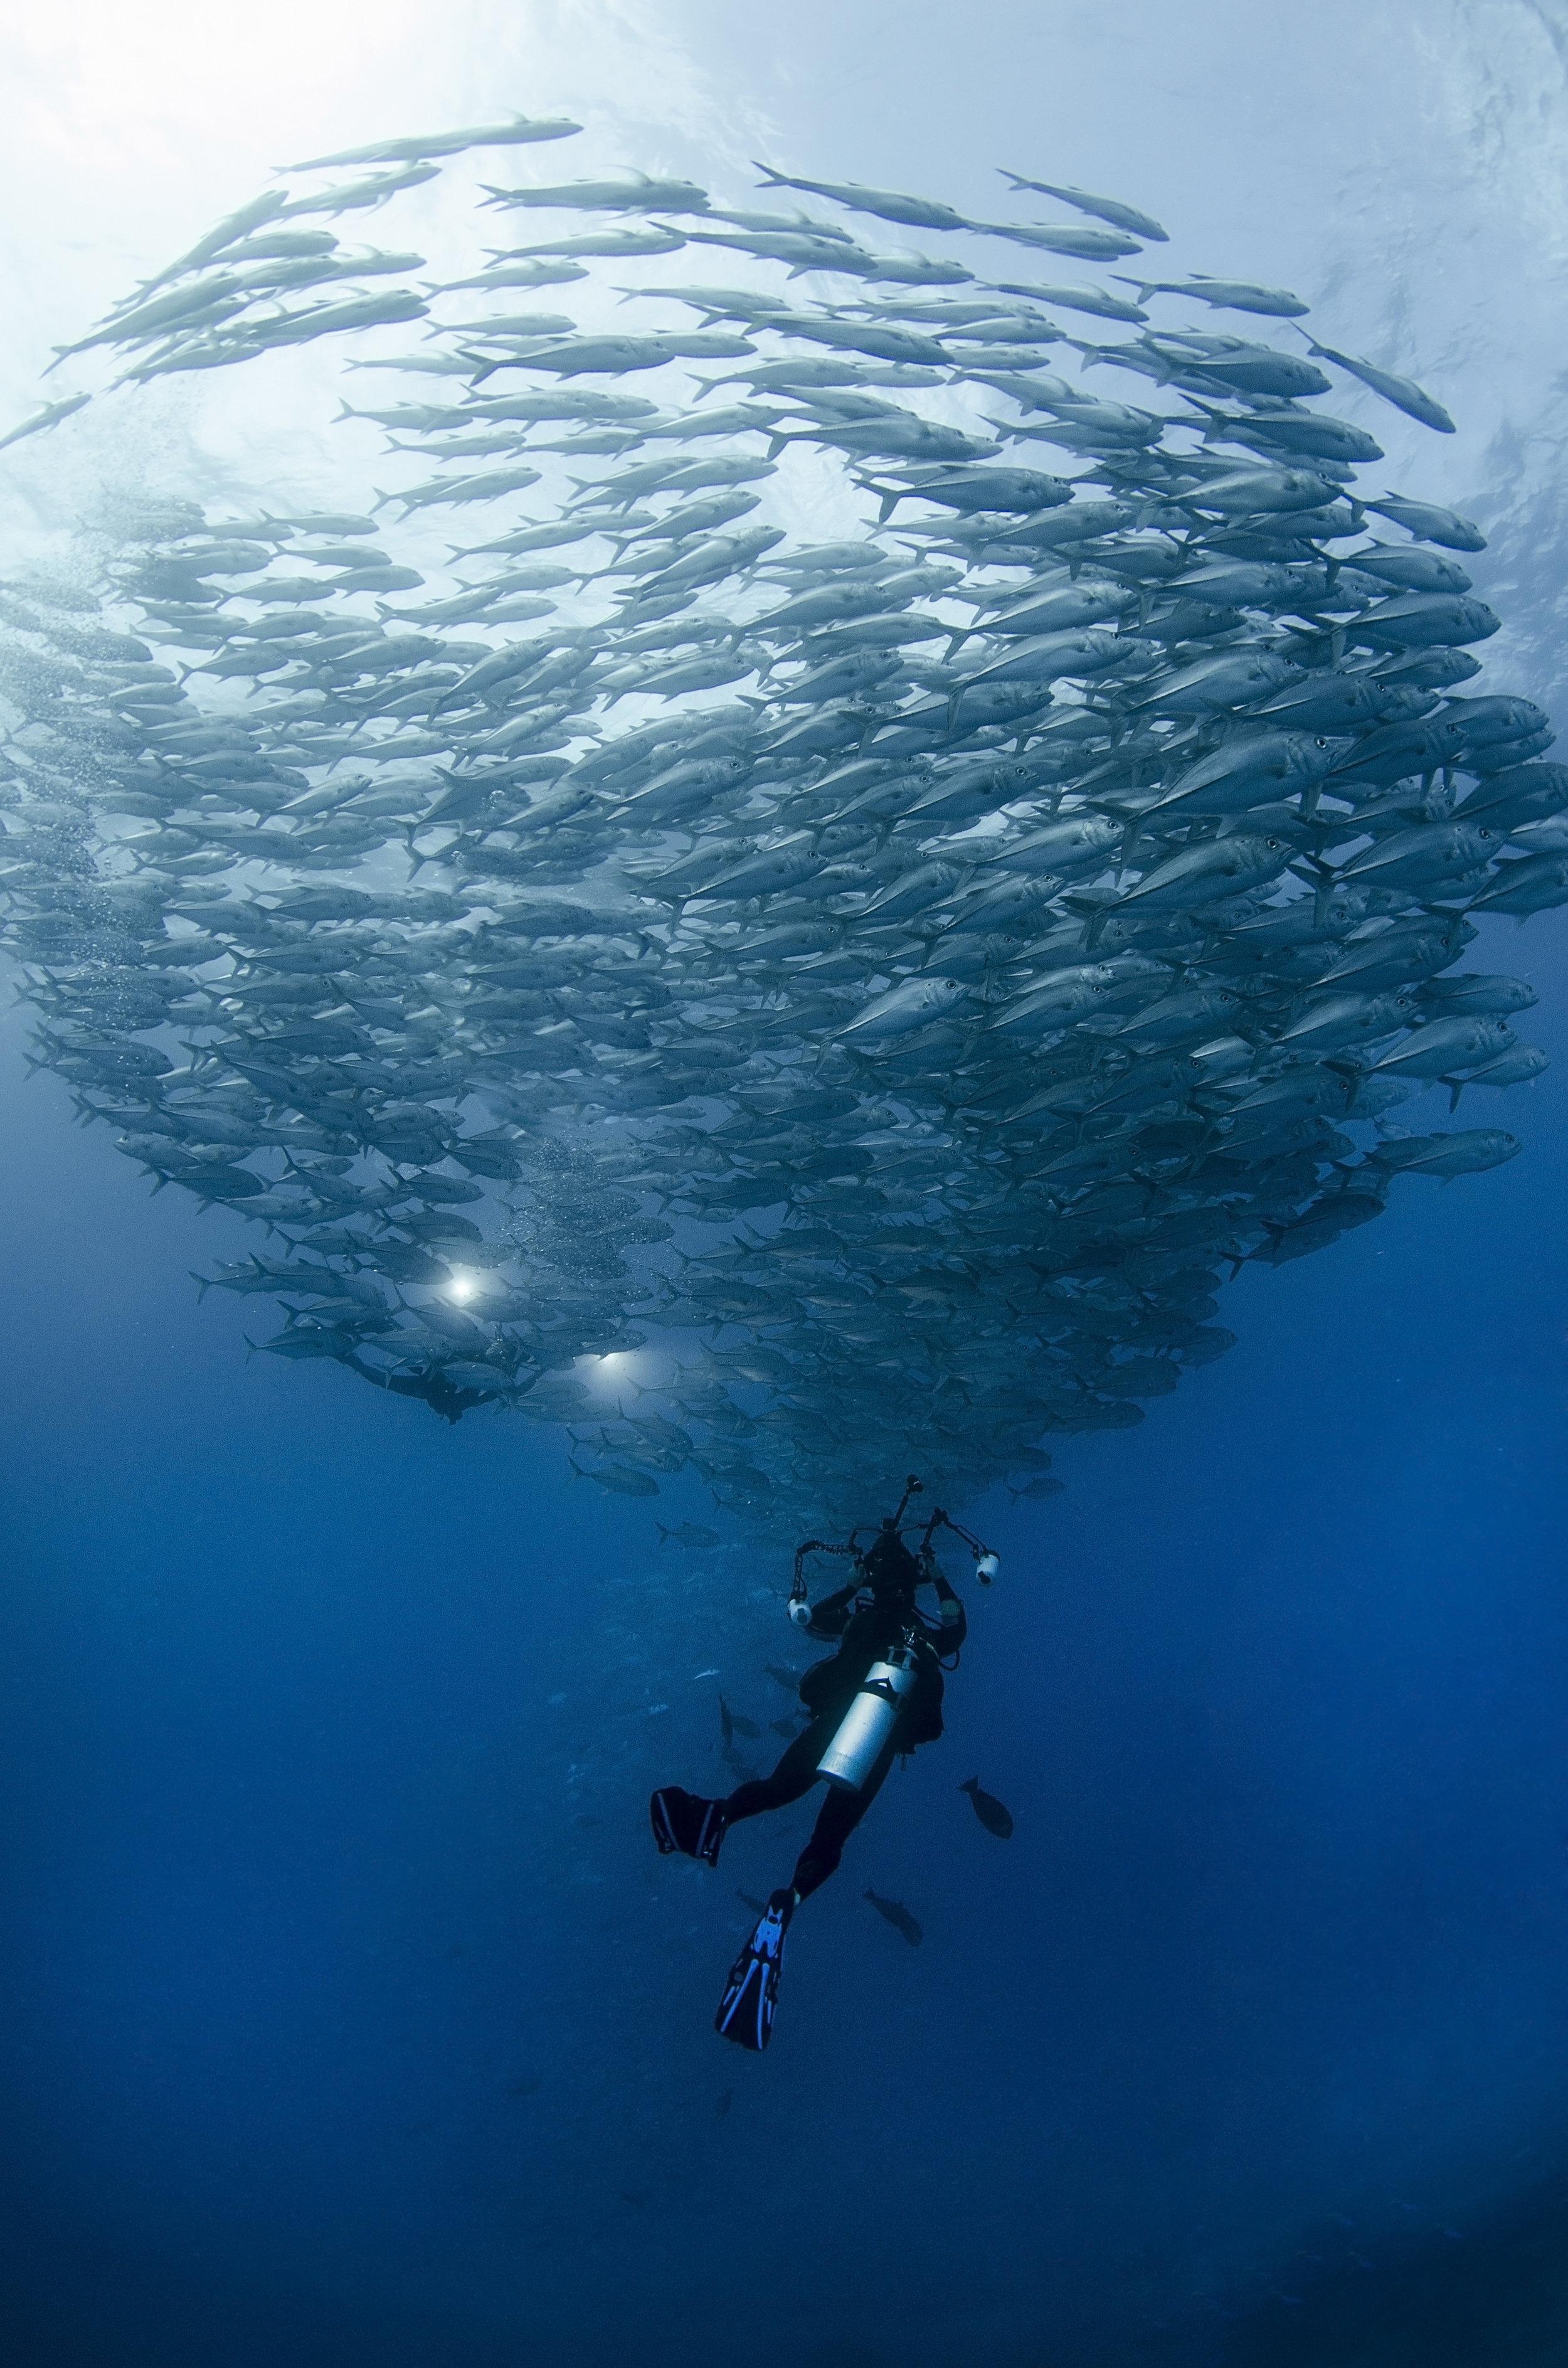 trevally school with diver amanda cotton / coral reef image bank